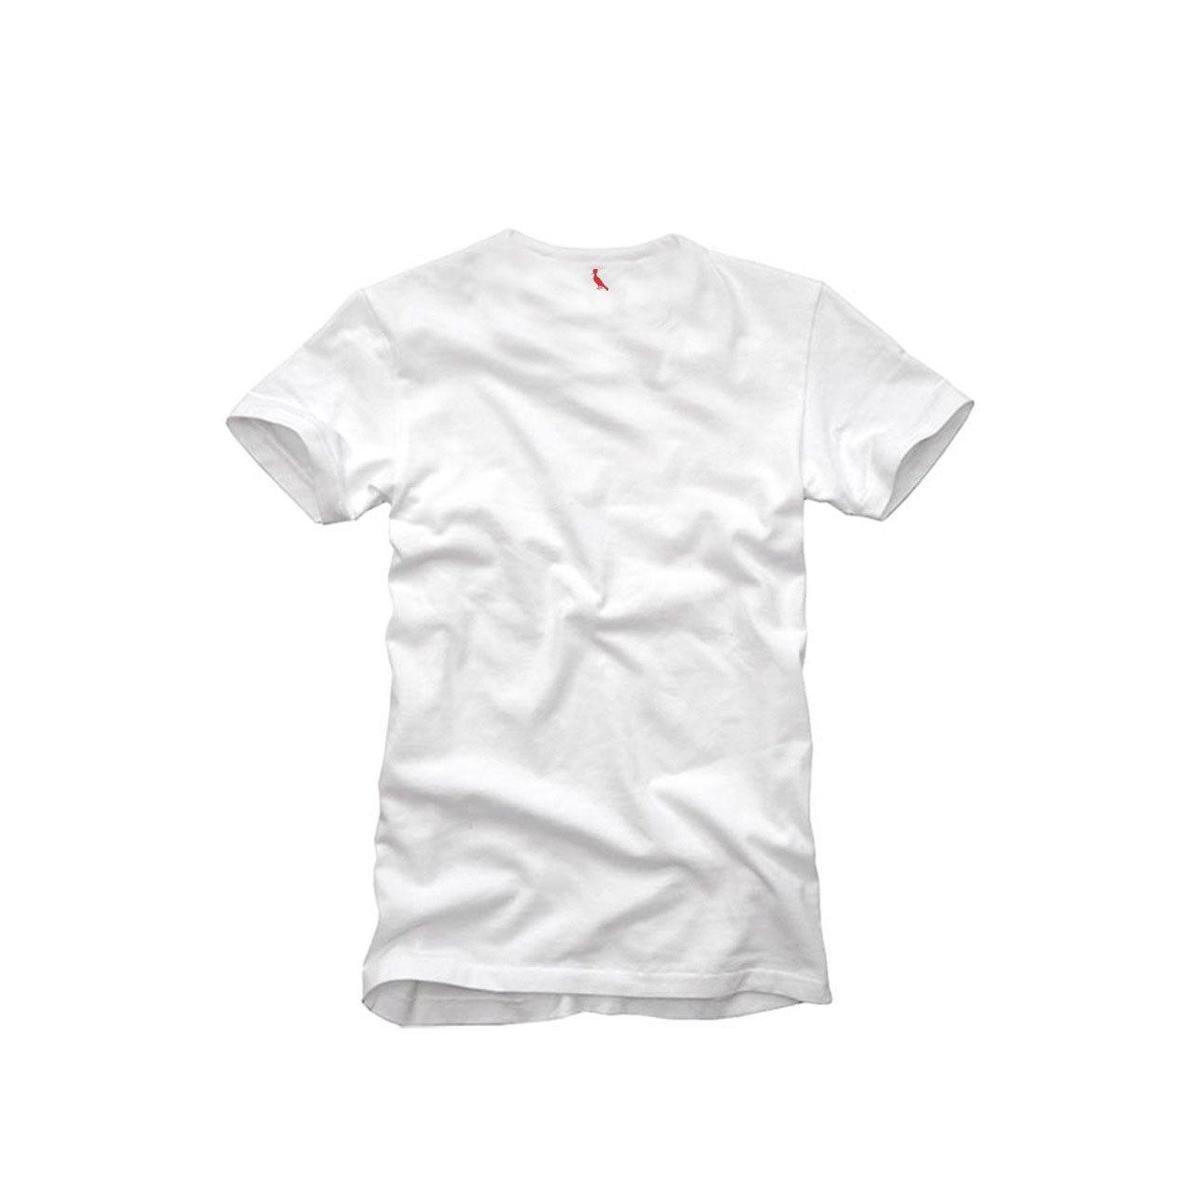 Camiseta Reserva Ganhador Masculina - Branco